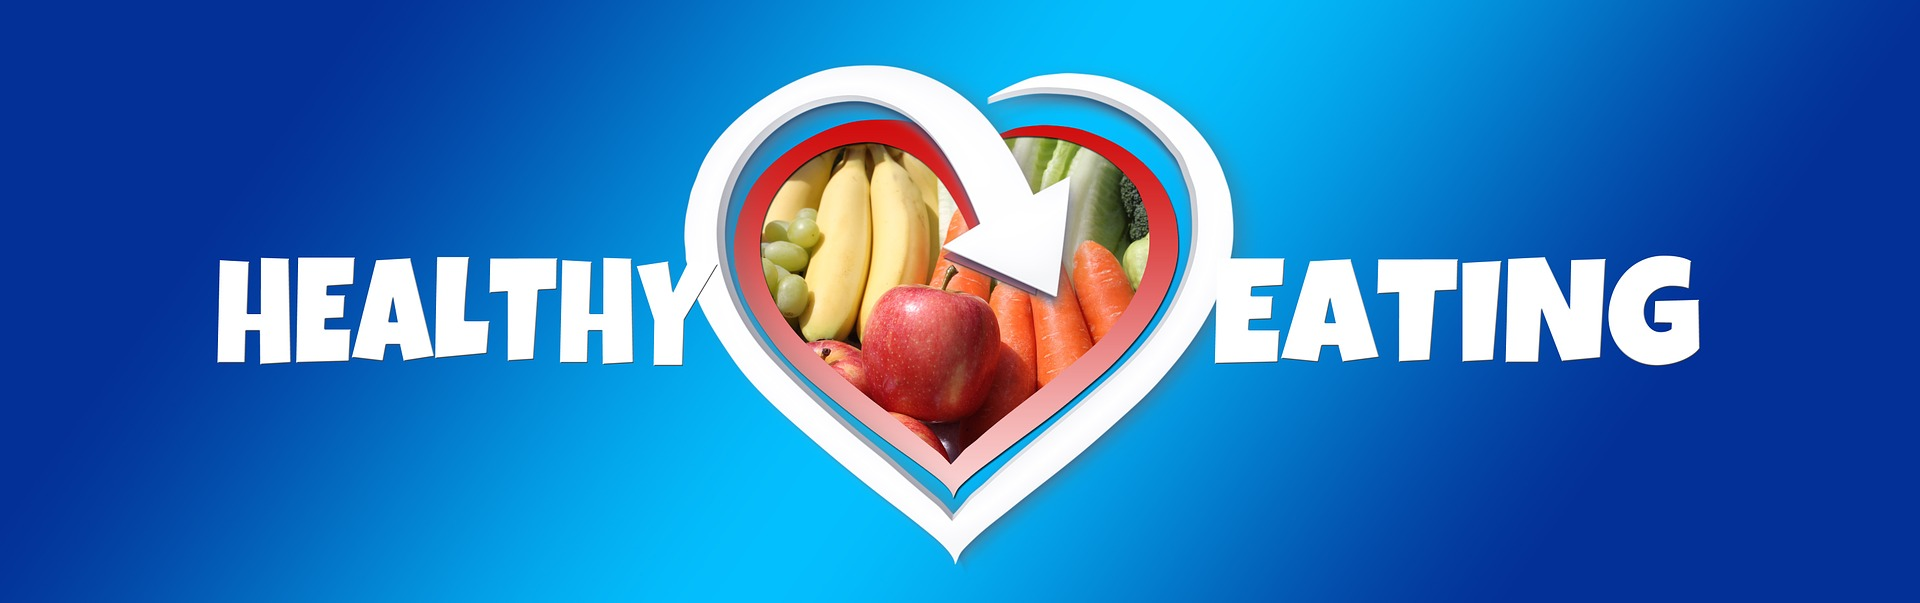 Hábitos de comida saludables